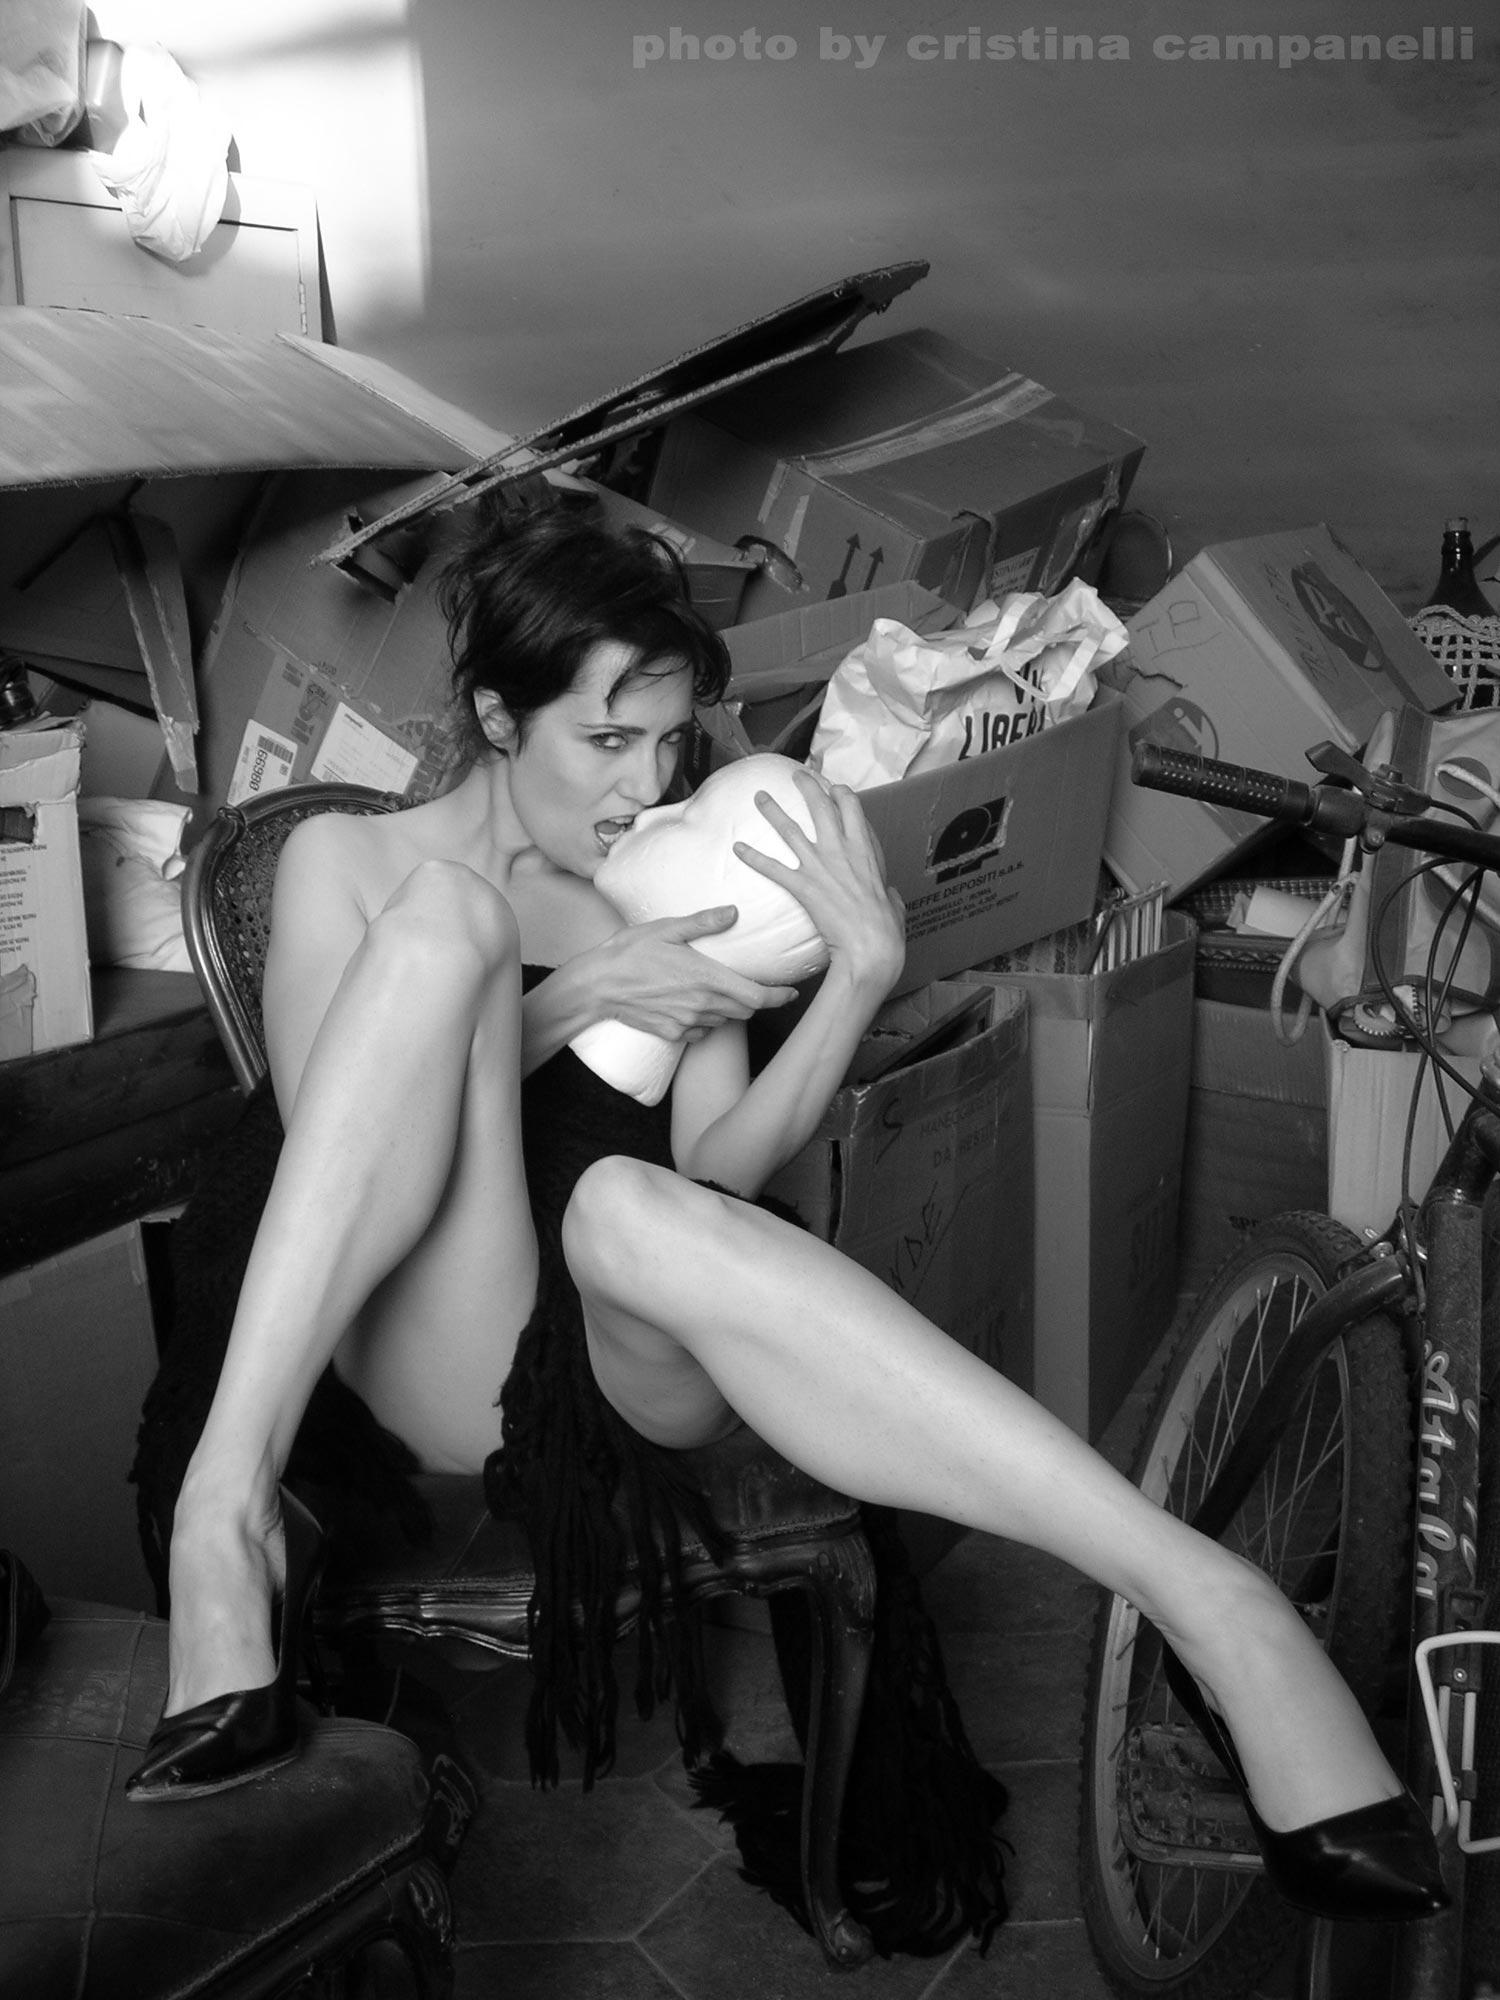 Coralina Cataldi-Tassoni photo by Cristina Campanelli (14).jpg